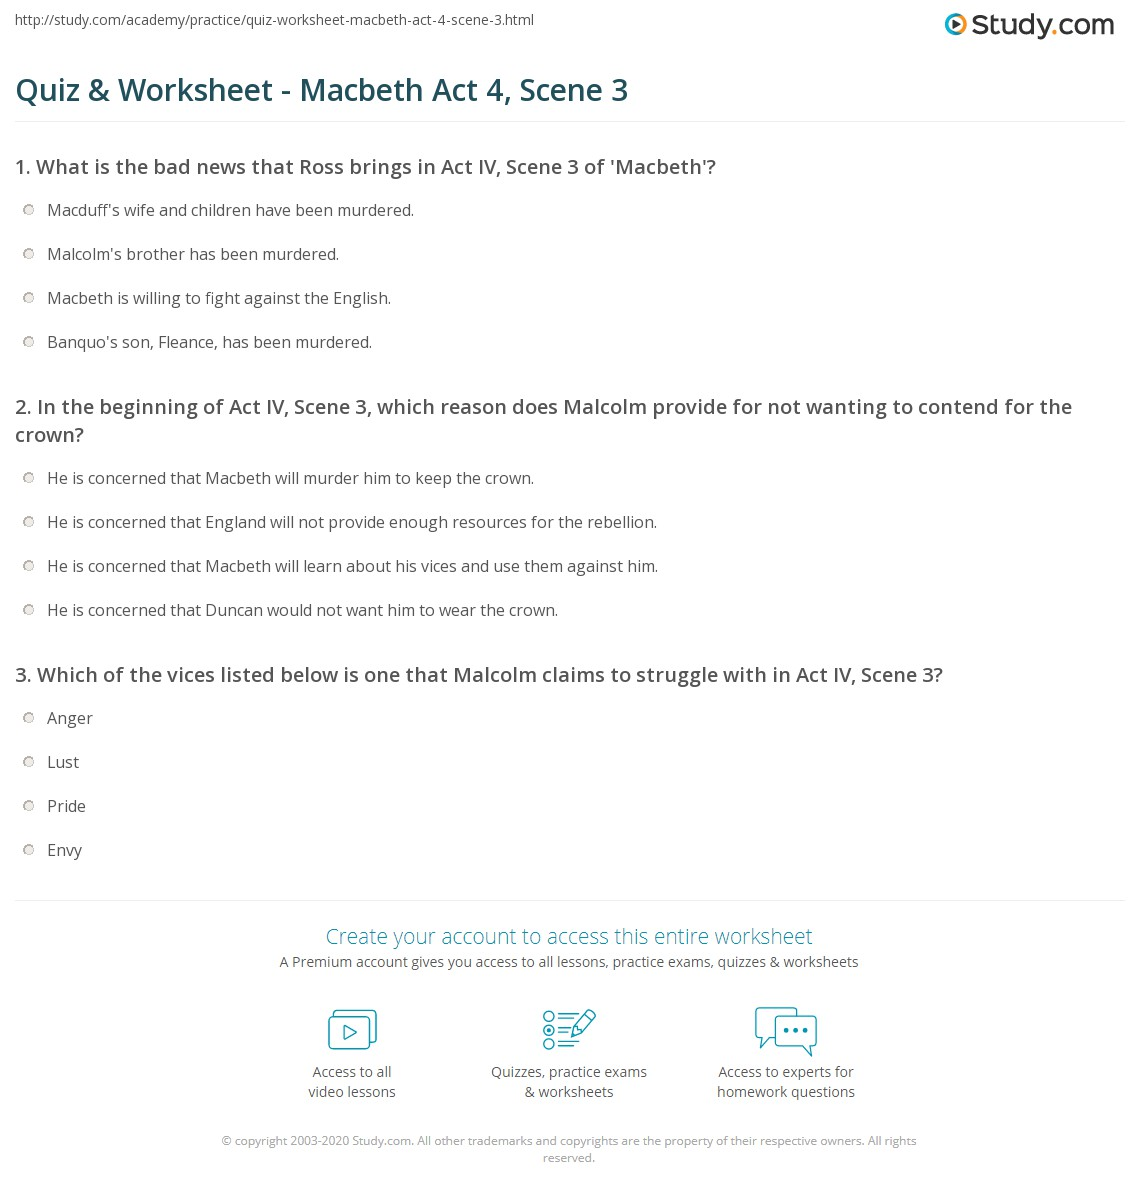 quiz worksheet macbeth act scene com print macbeth act 4 scene 3 summary quotes worksheet